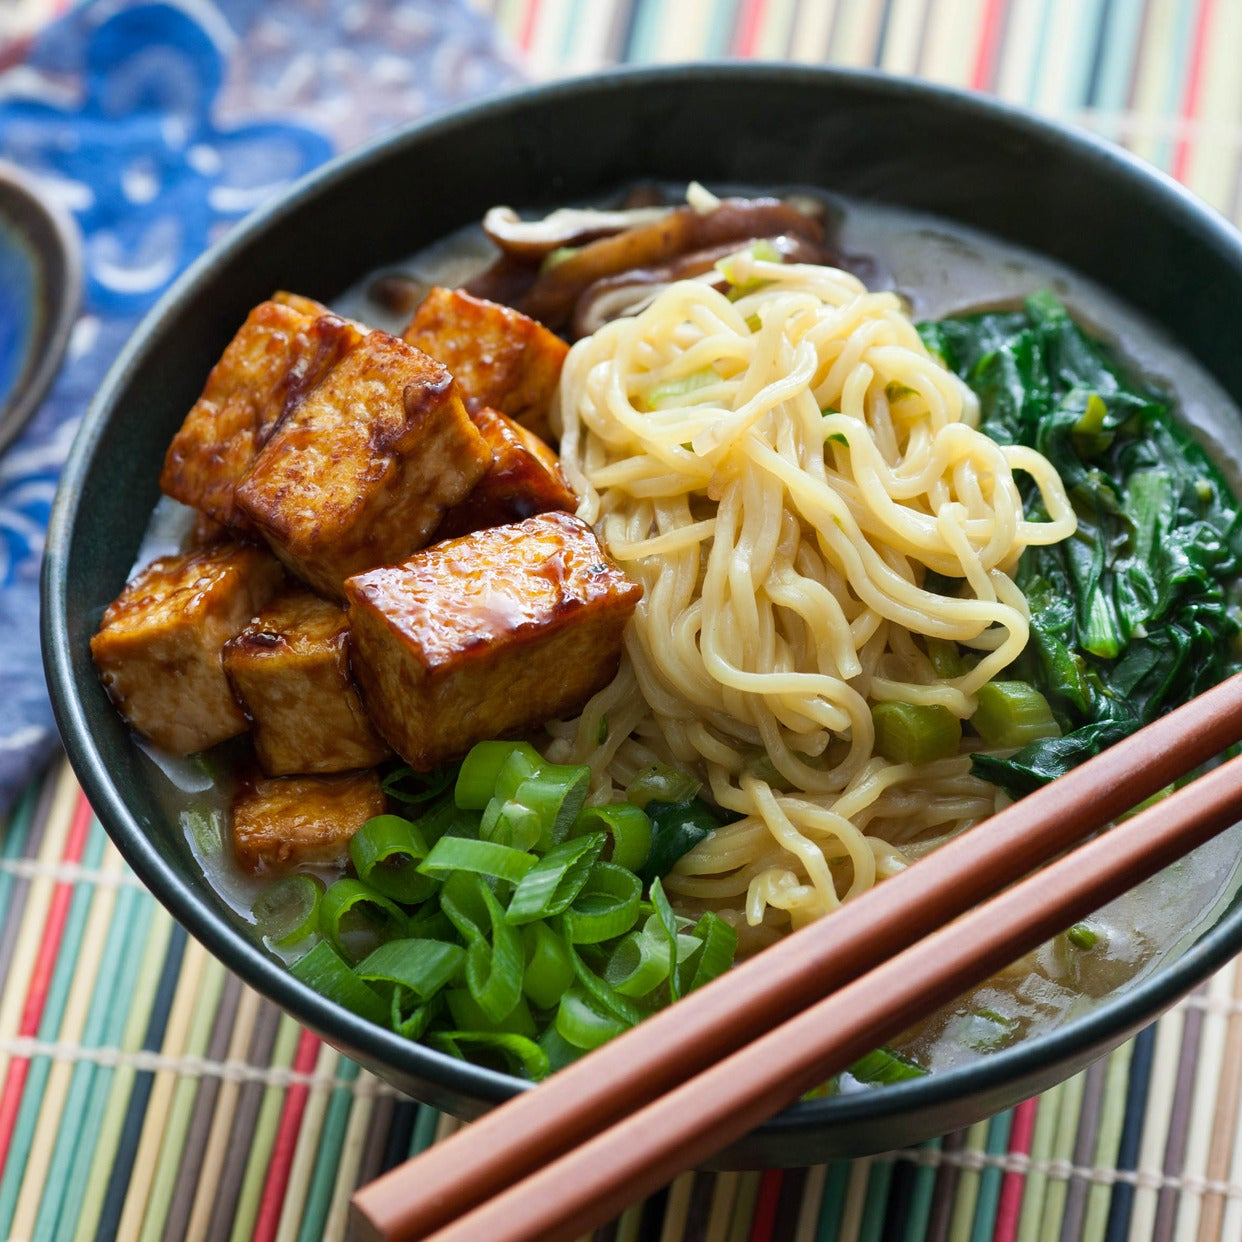 Recipe: Miso & Shiitake Ramen With Hoisin-Glazed Tofu